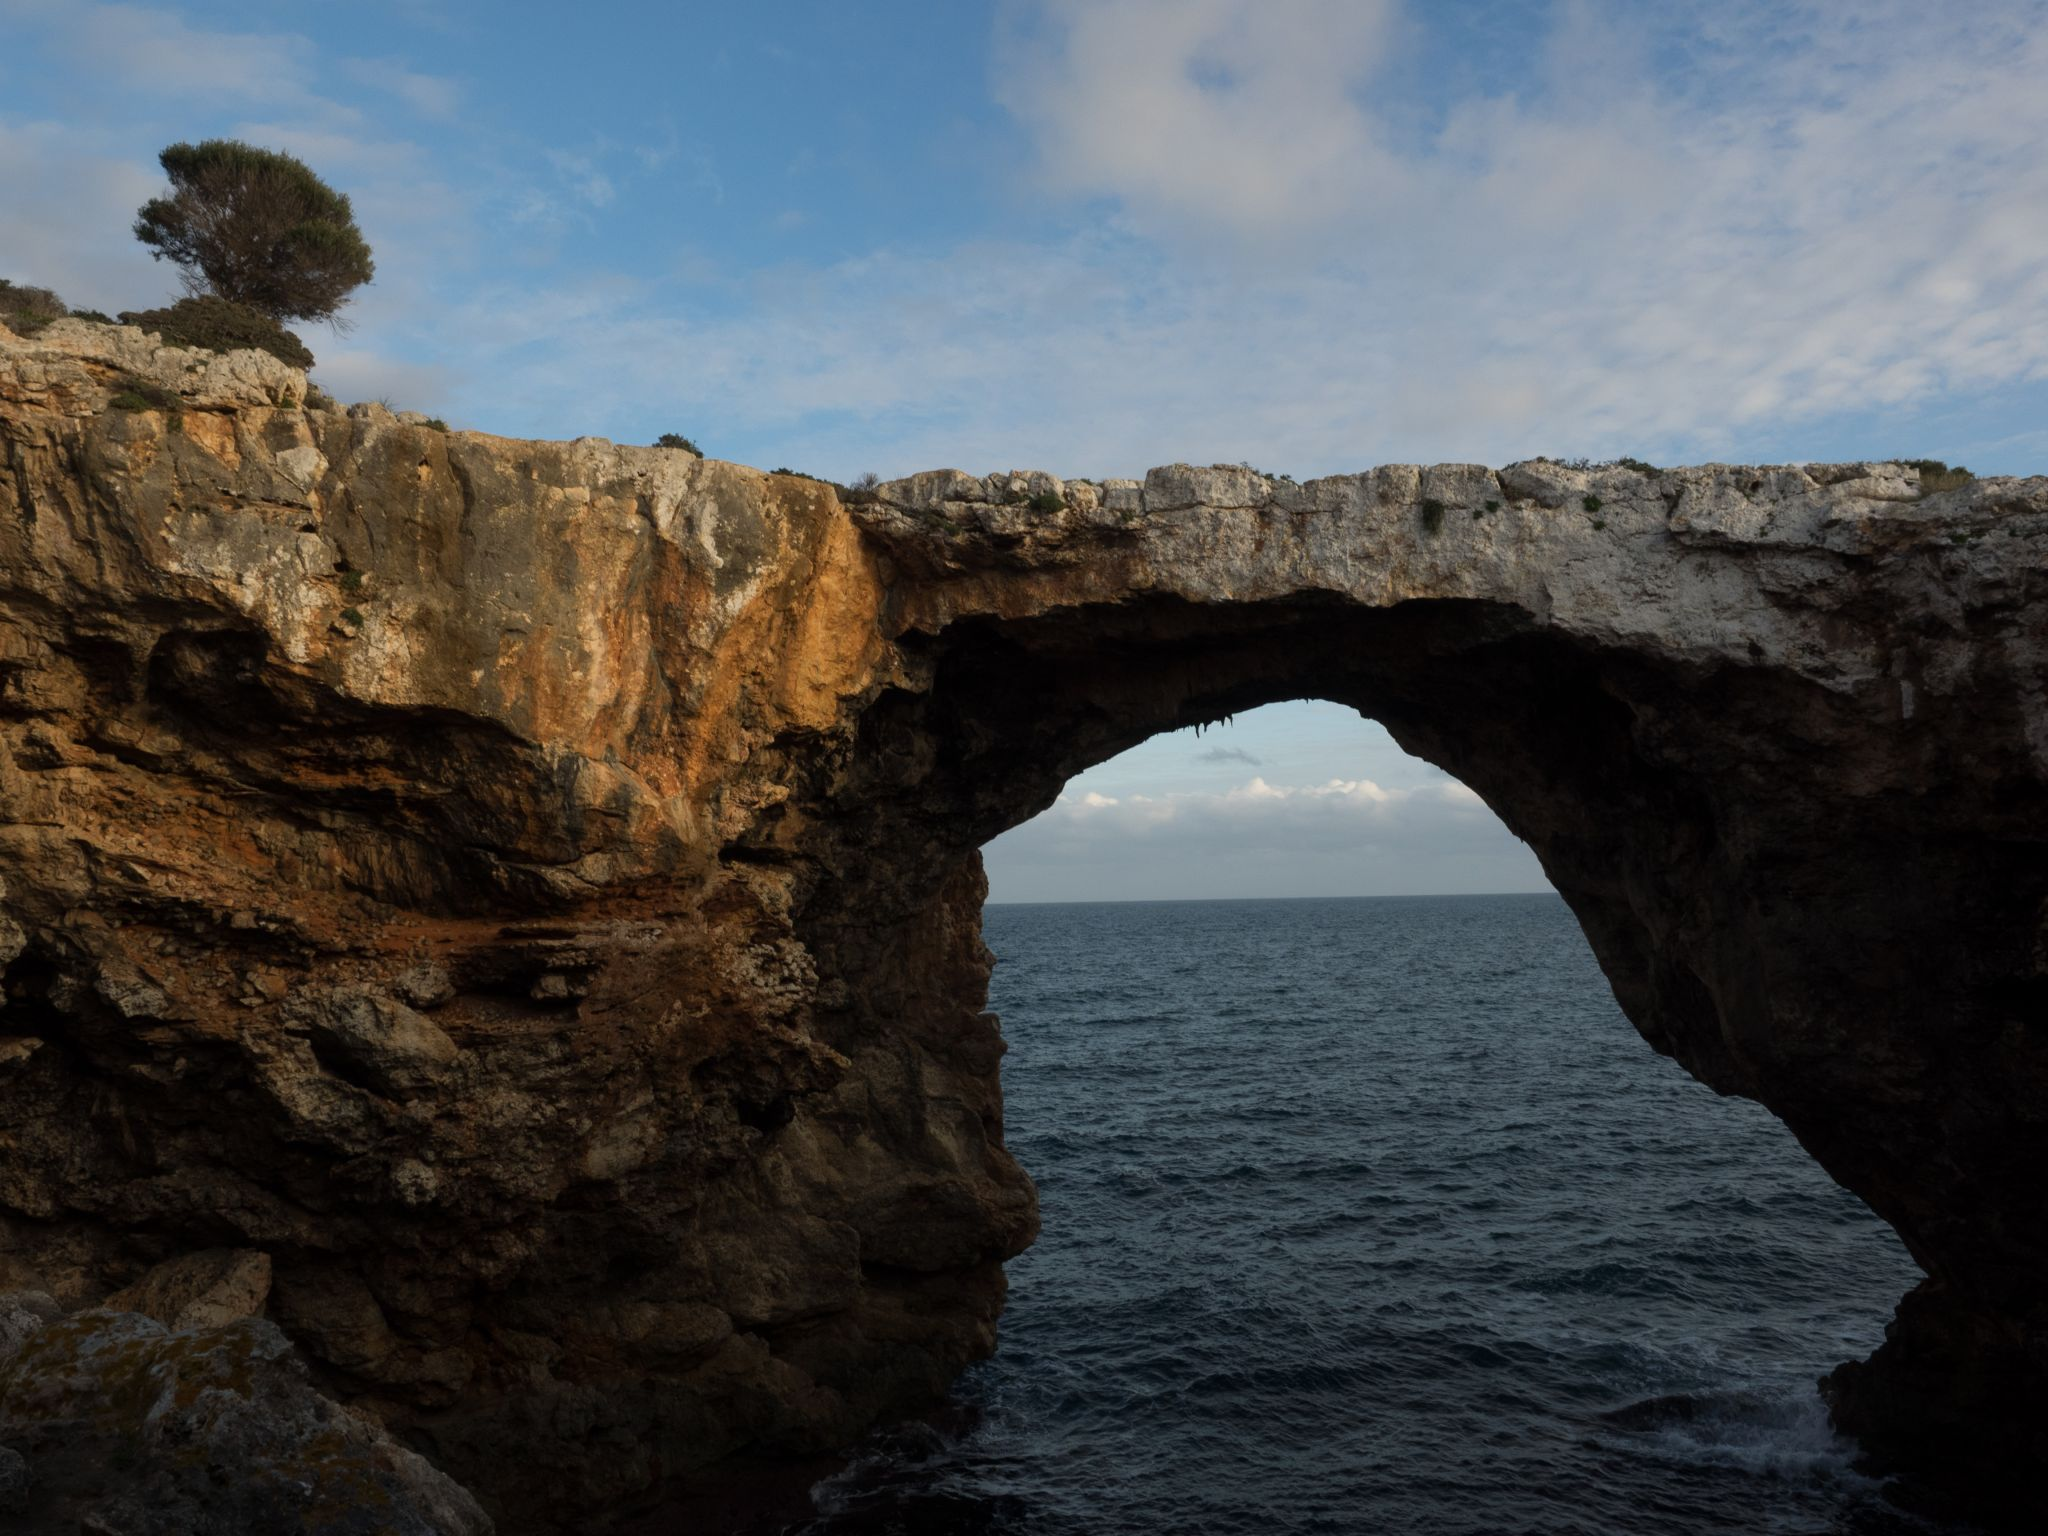 Cova des pont, Mallorca, Spain